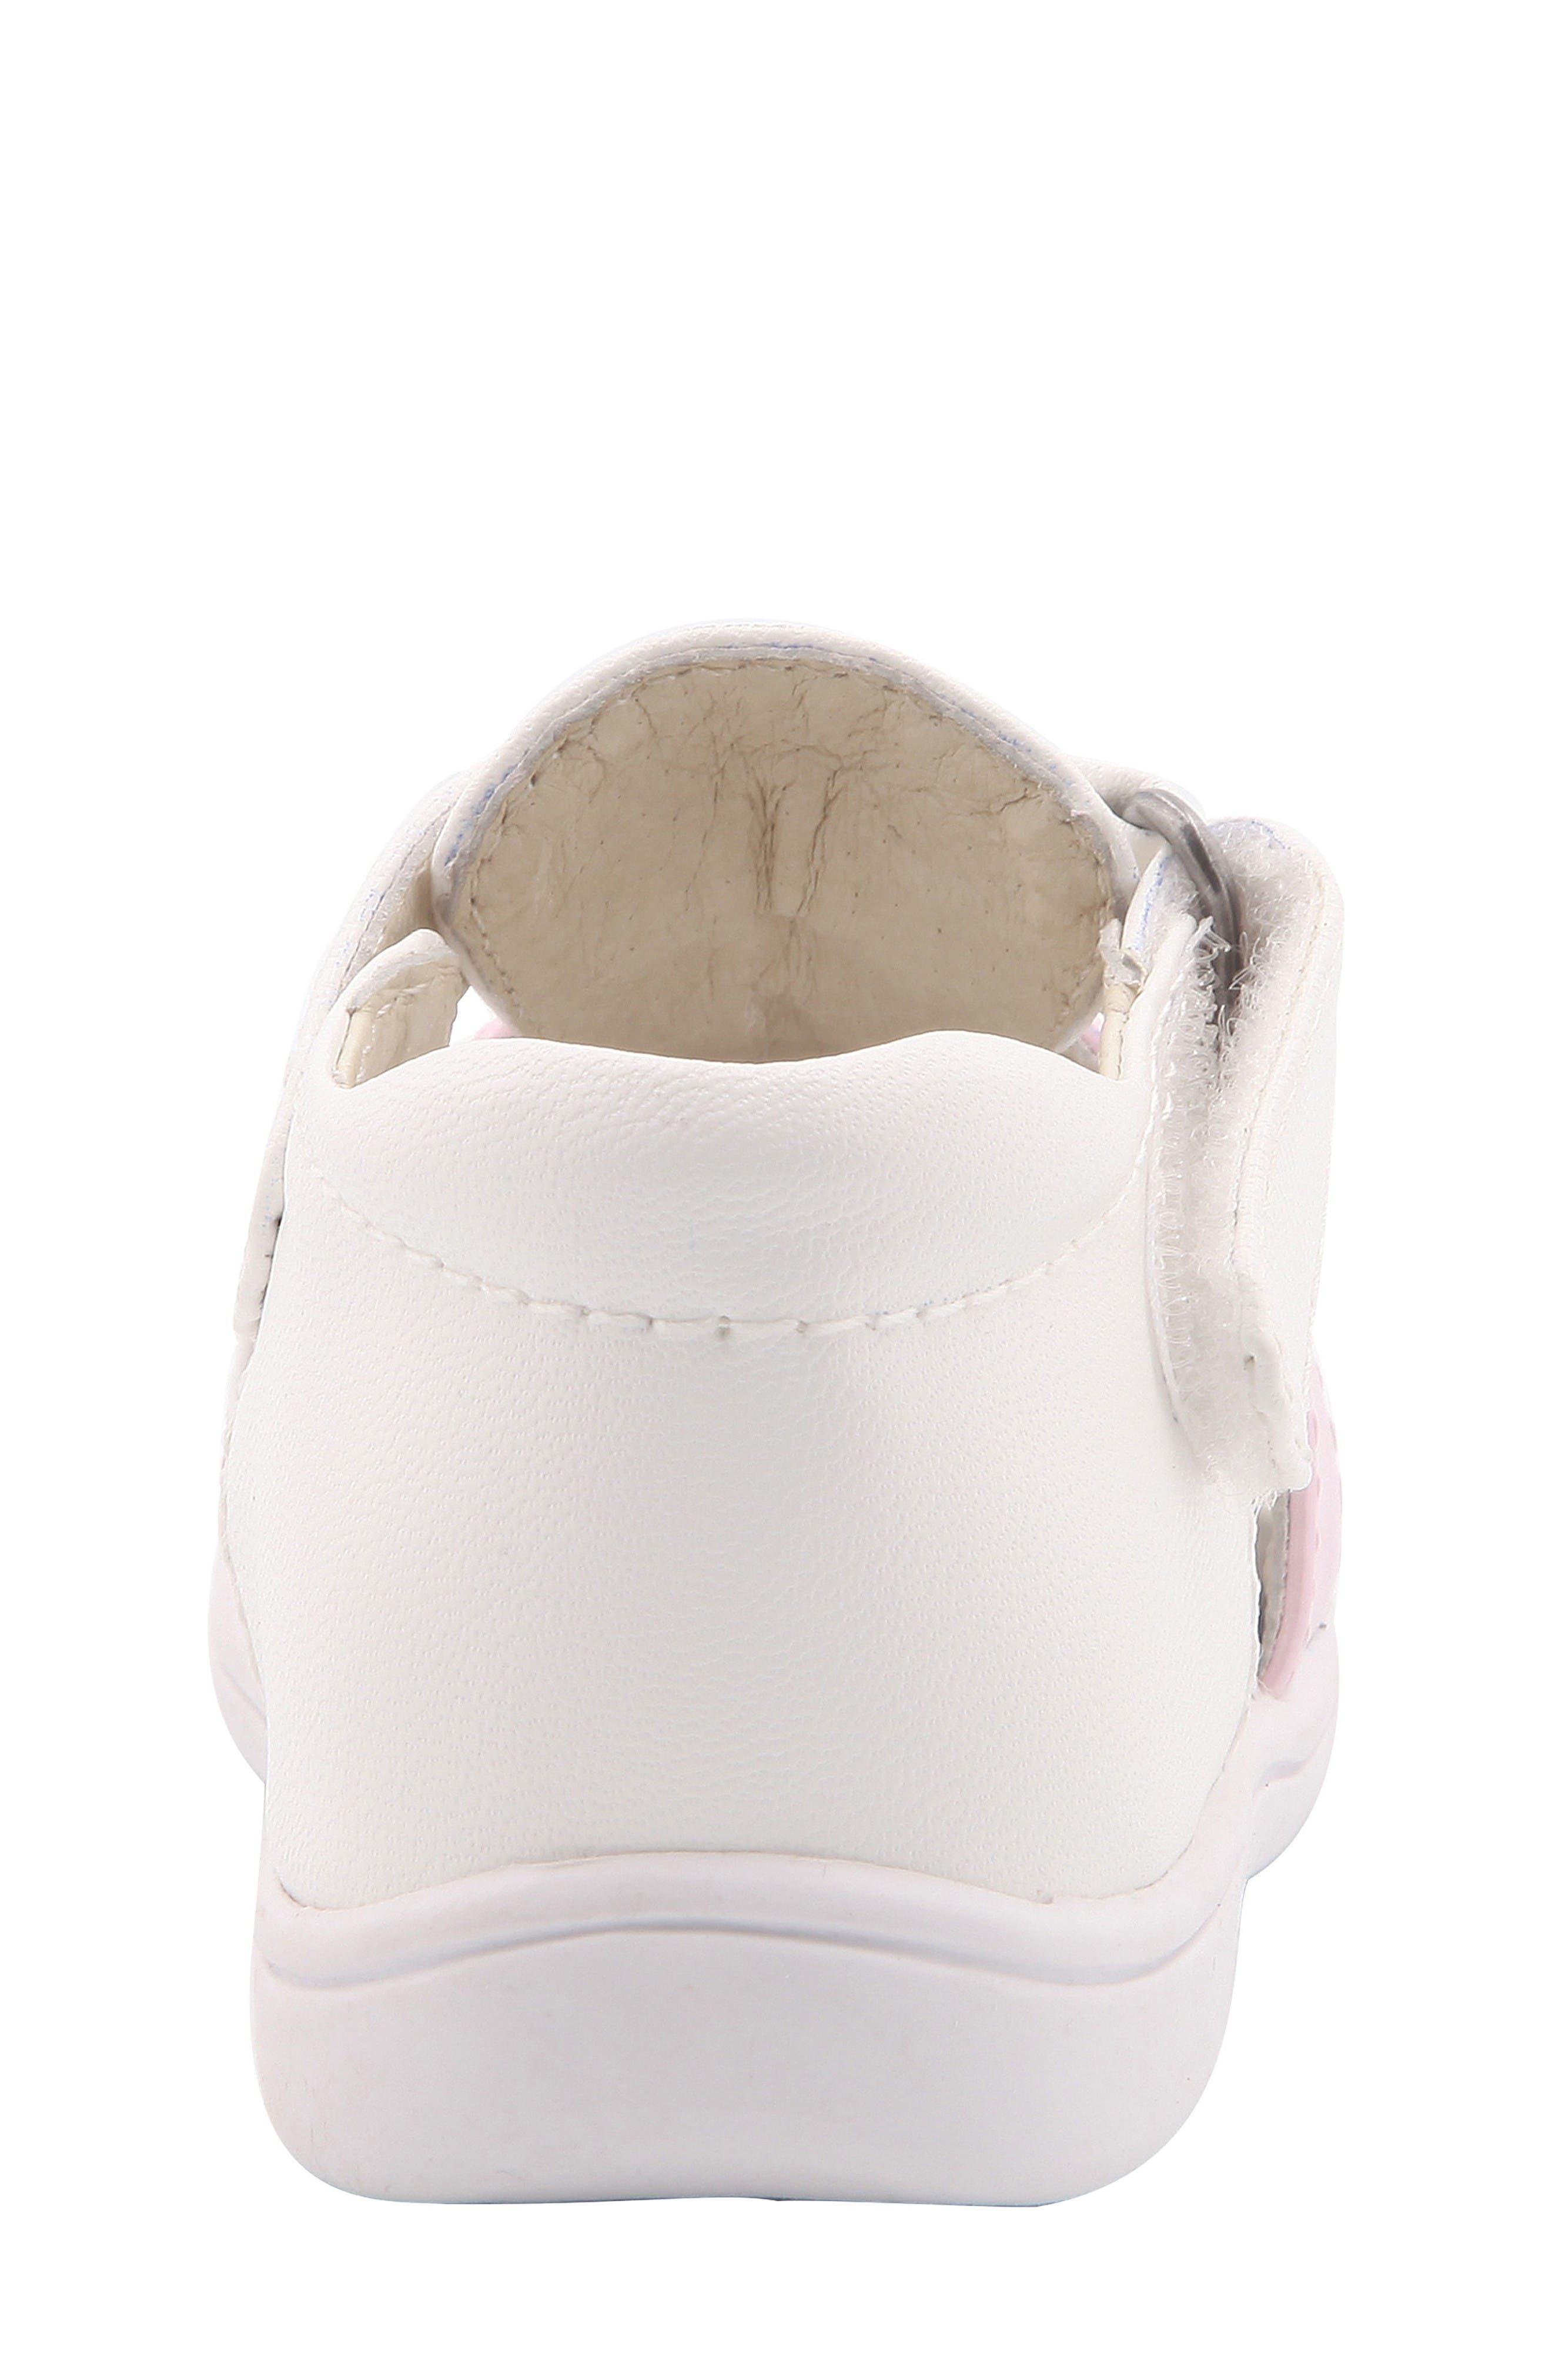 Gage Fisherman Sandal,                             Alternate thumbnail 8, color,                             White Faux Leather